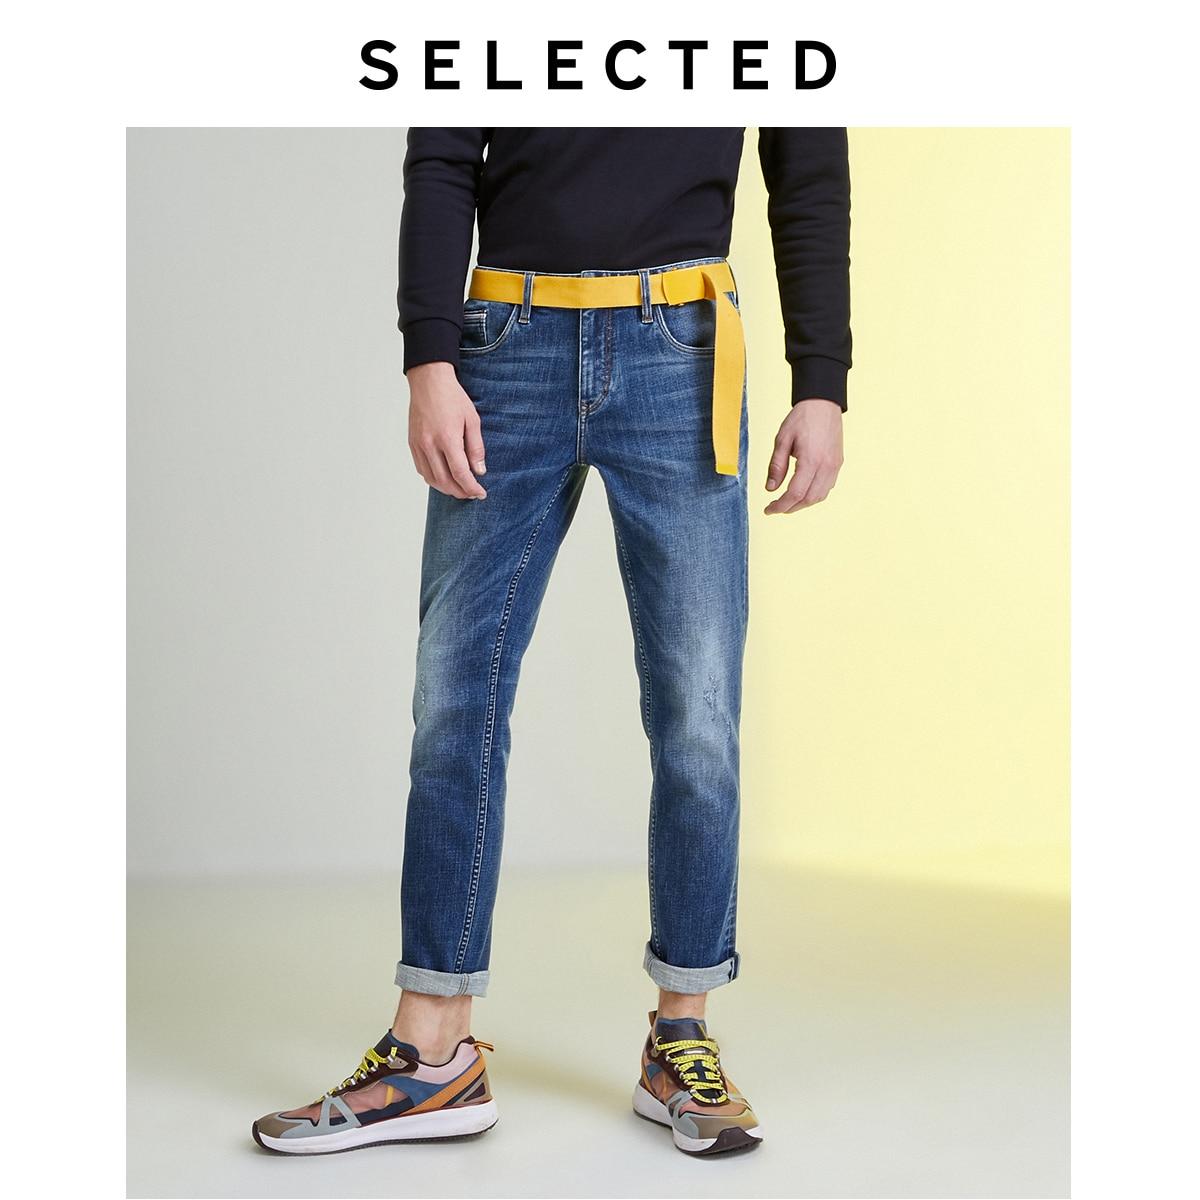 SELECTED Men's Slim Fit Denim Pants New Casual Stretch Cotton Jeans LAB|419432526